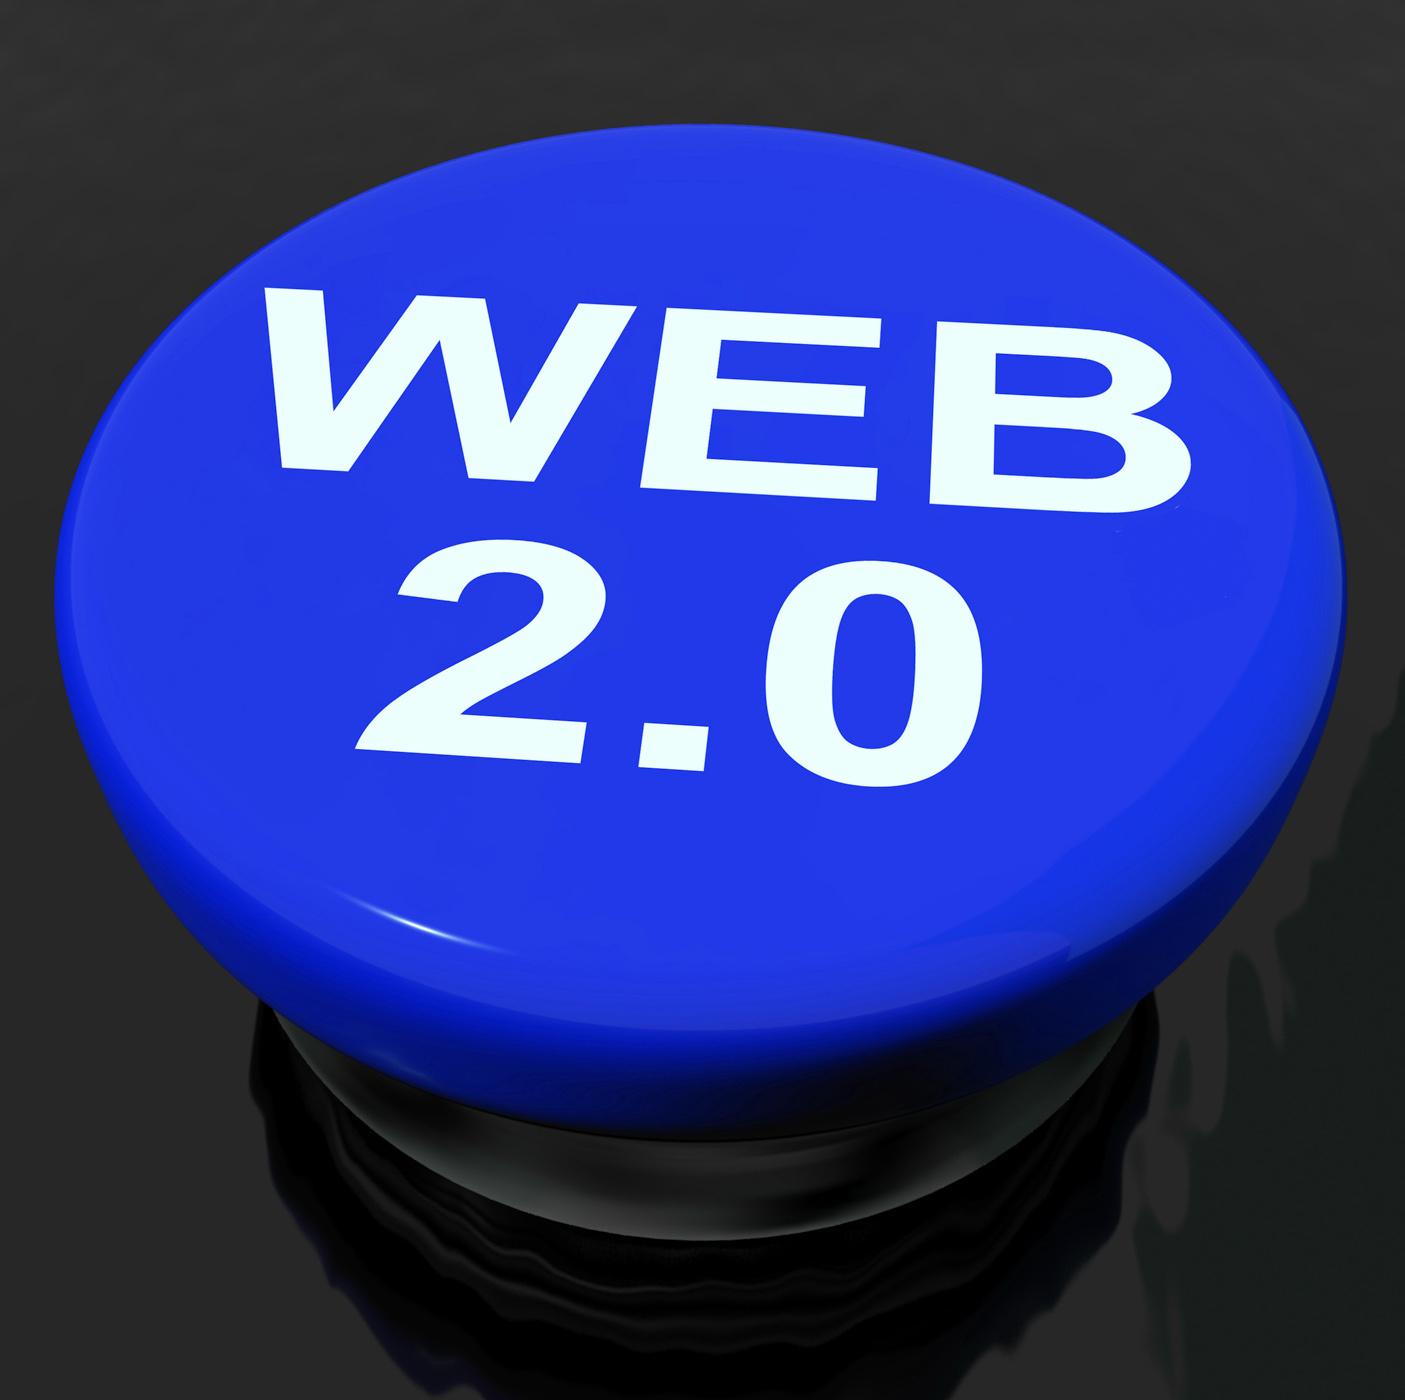 Web 20 button means dynamic user www photo